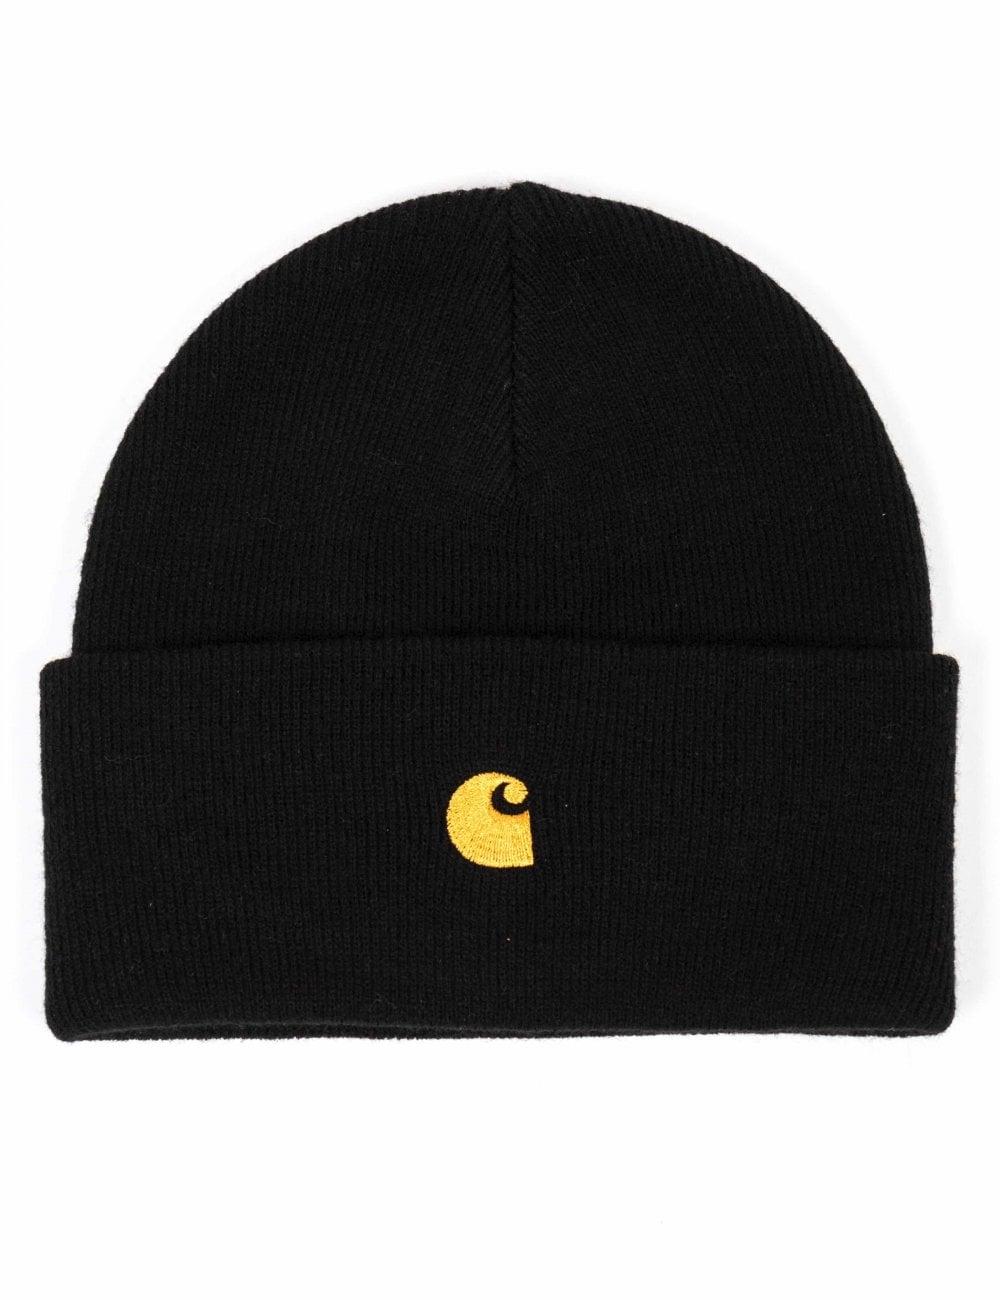 1ed5c0b06fc25 Carhartt WIP Chase Beanie Hat - Black - Accessories from Fat Buddha ...